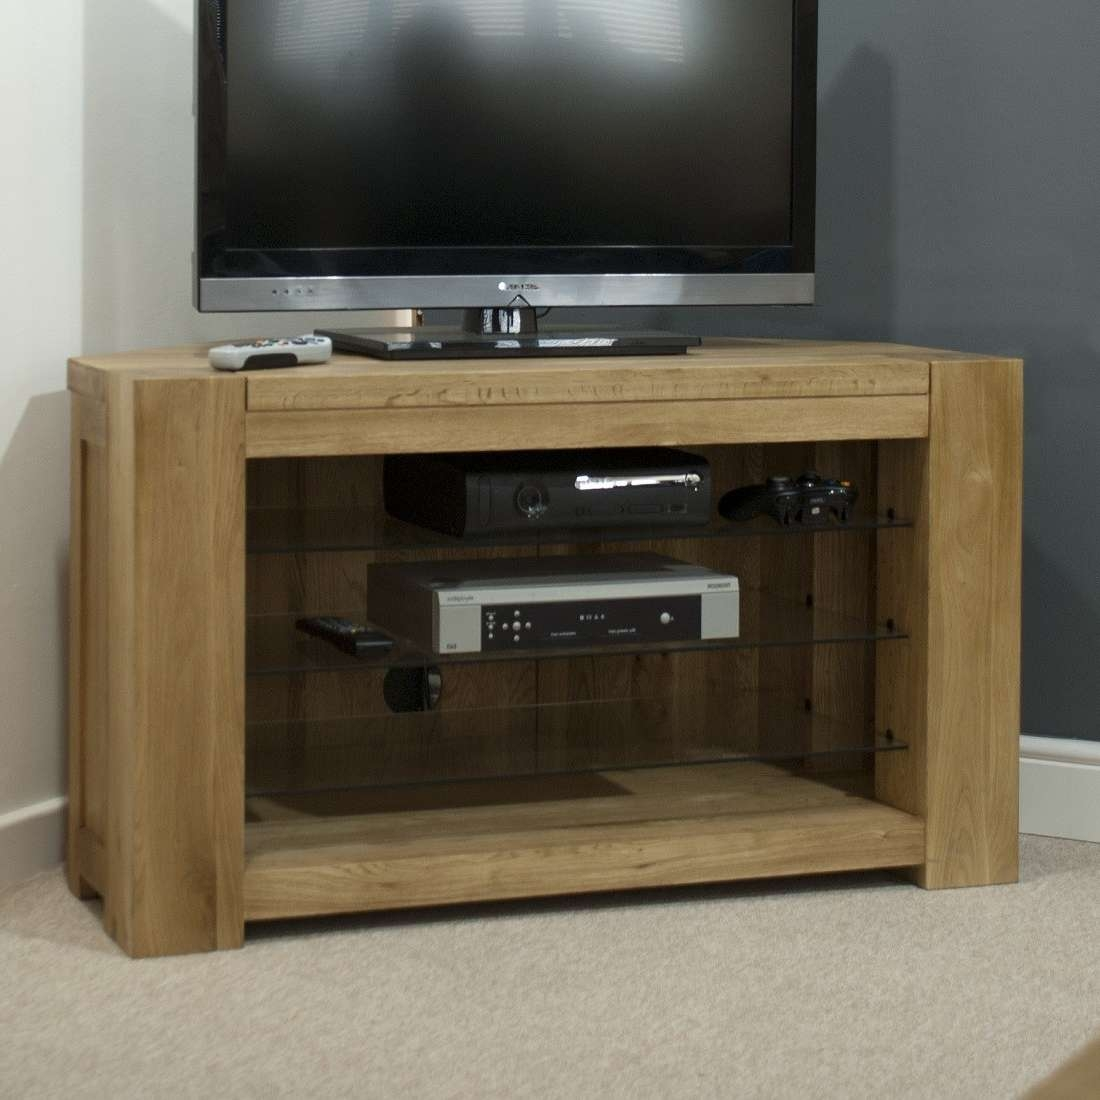 Trend Solid Oak Corner Tv Unit | Oak Furniture Uk With Solid Wood Corner Tv Cabinets (View 16 of 20)